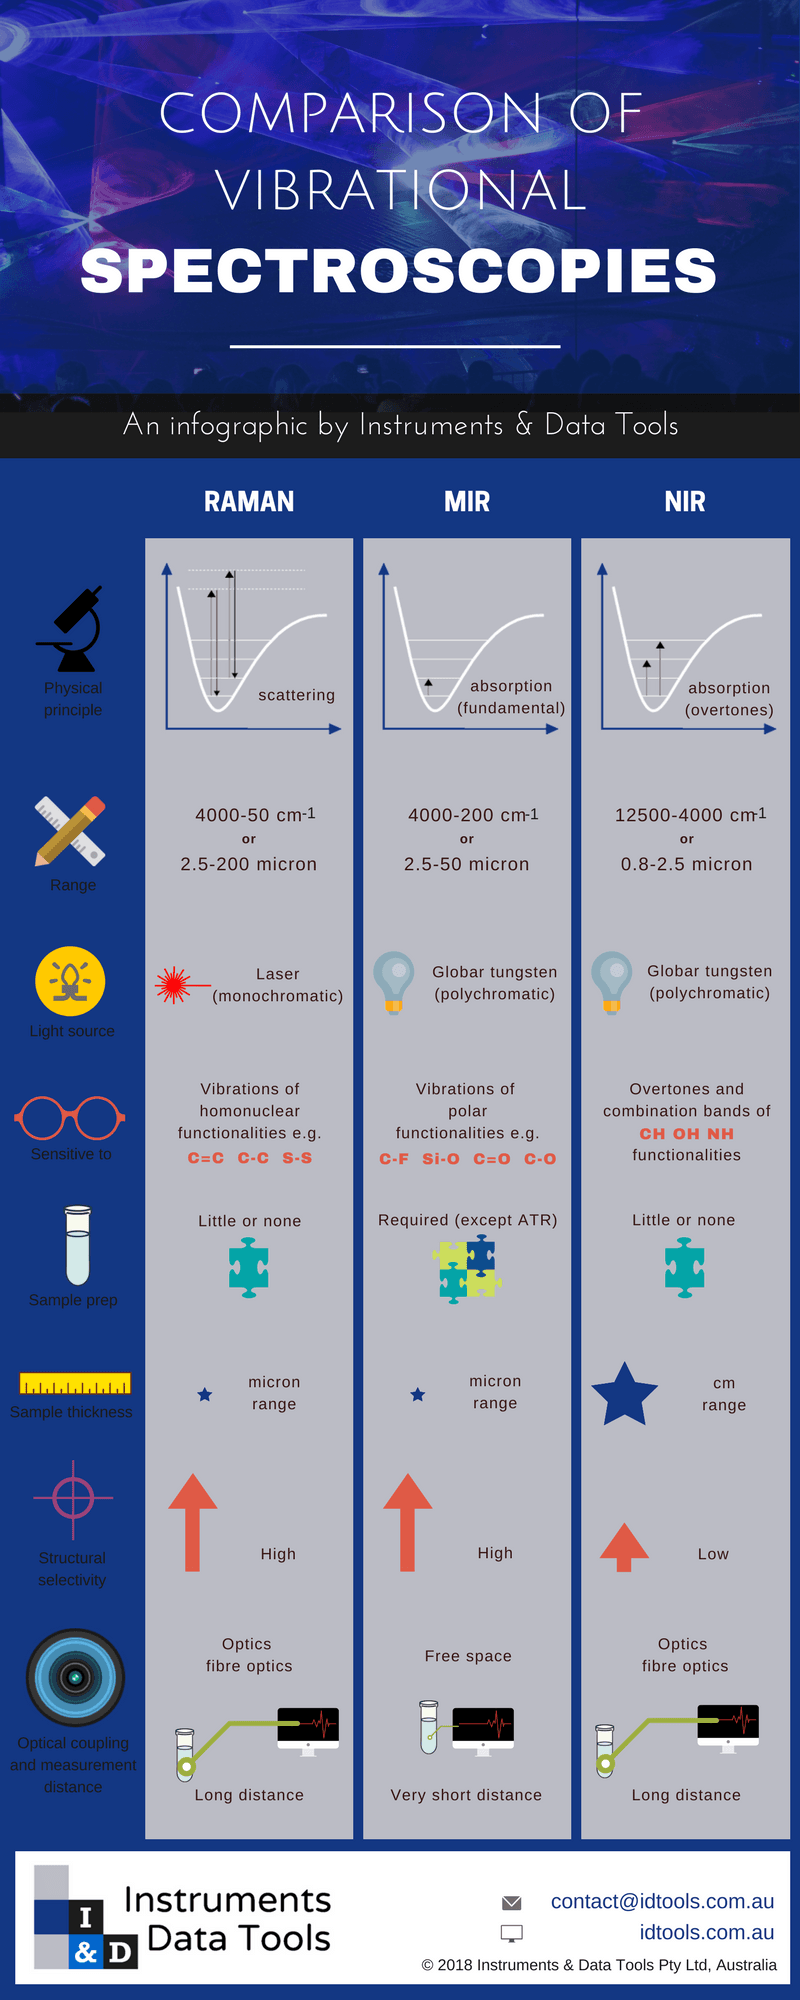 Comparison between Raman, MIR and NIR spectroscopy